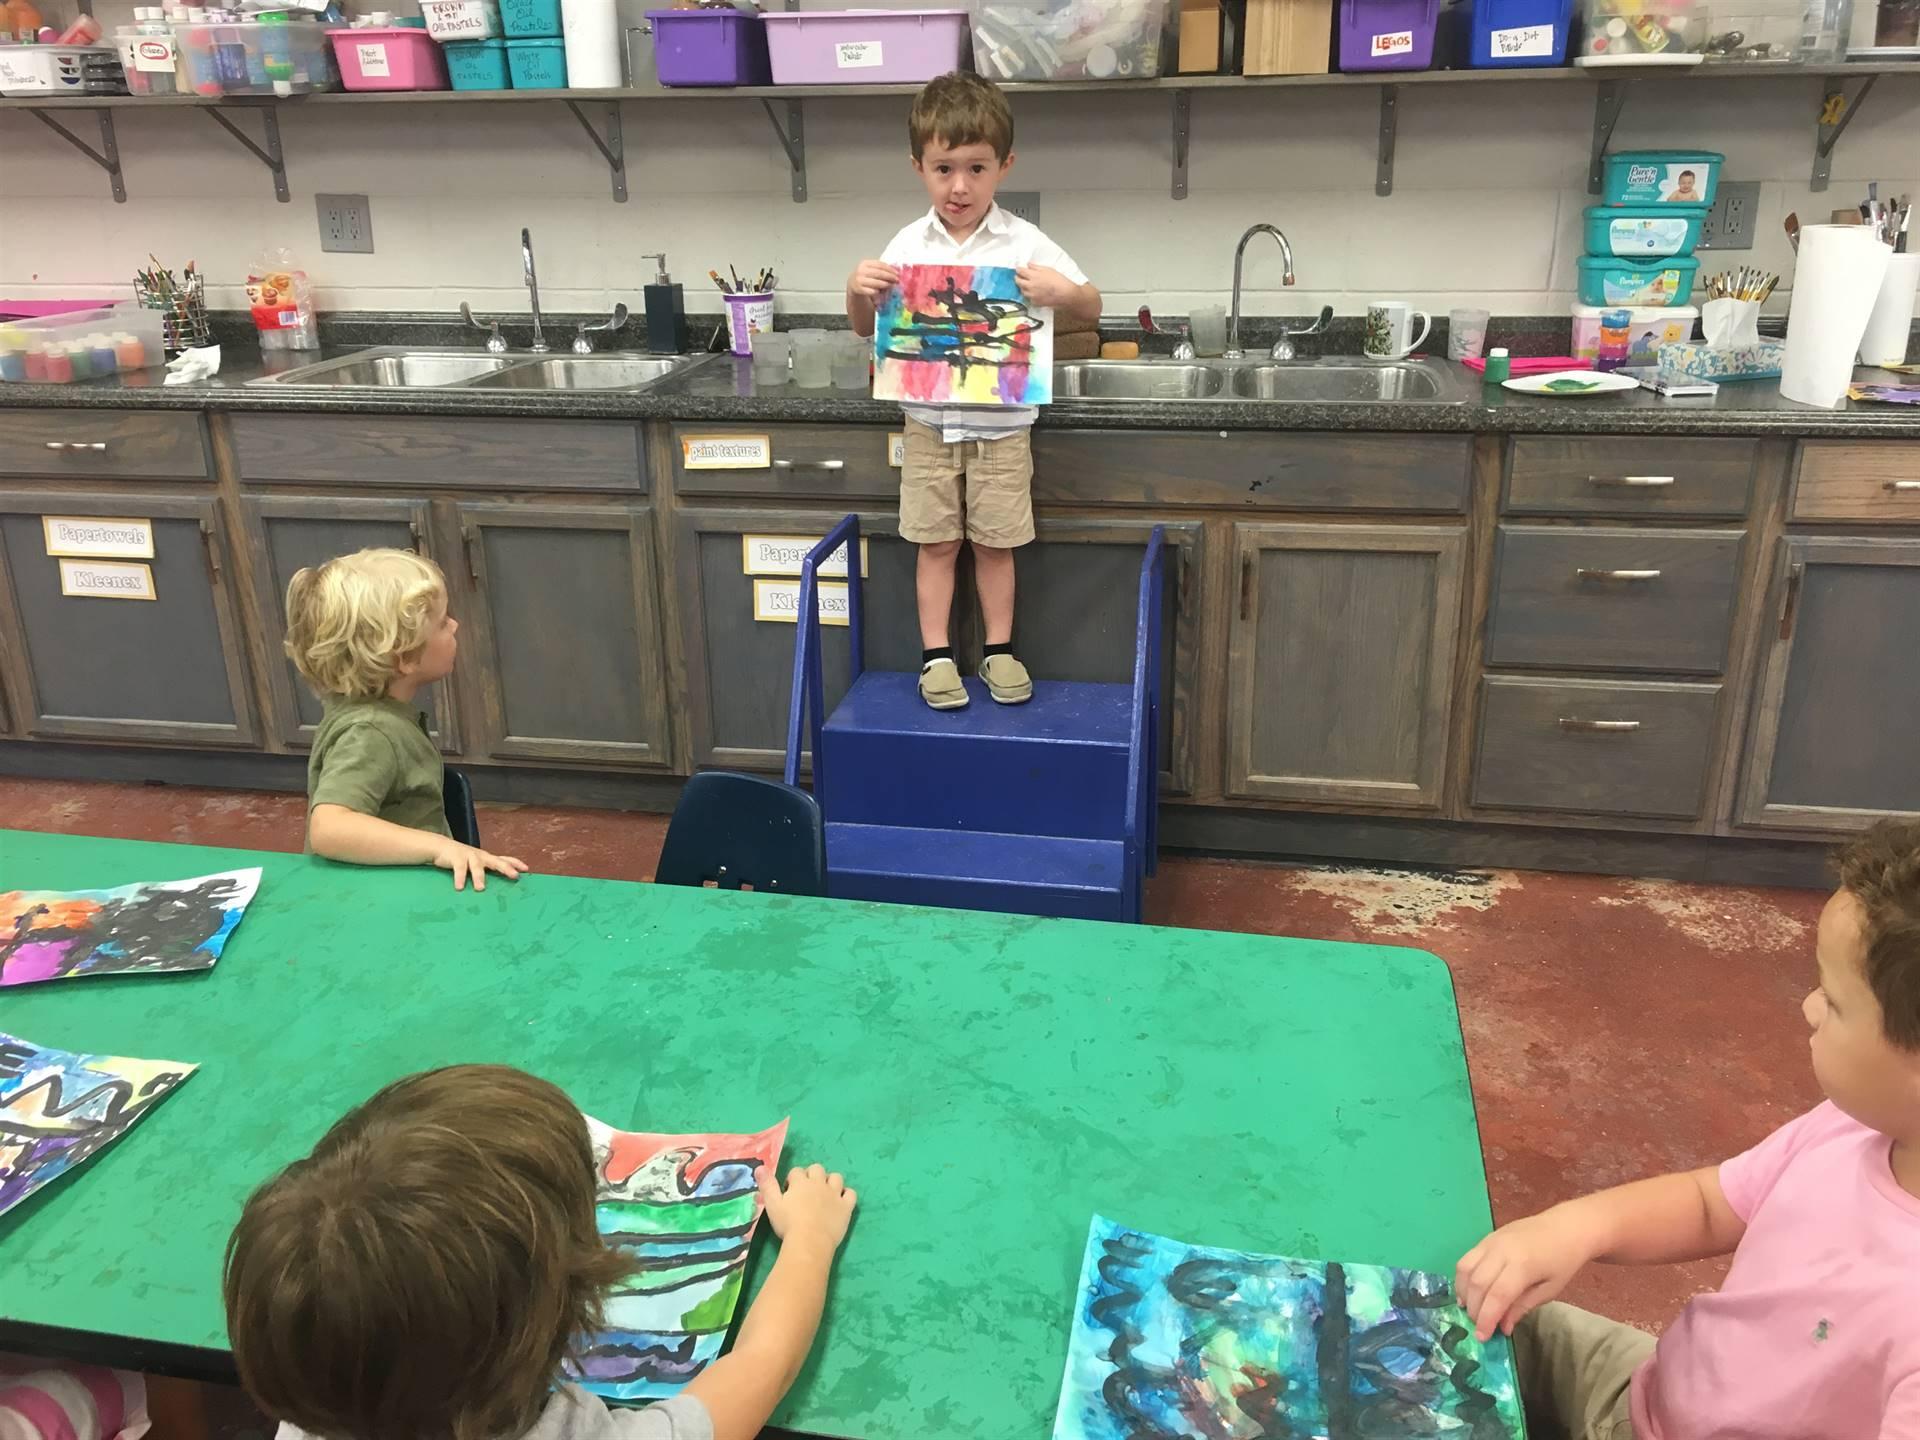 Evan presenting his masterpiece